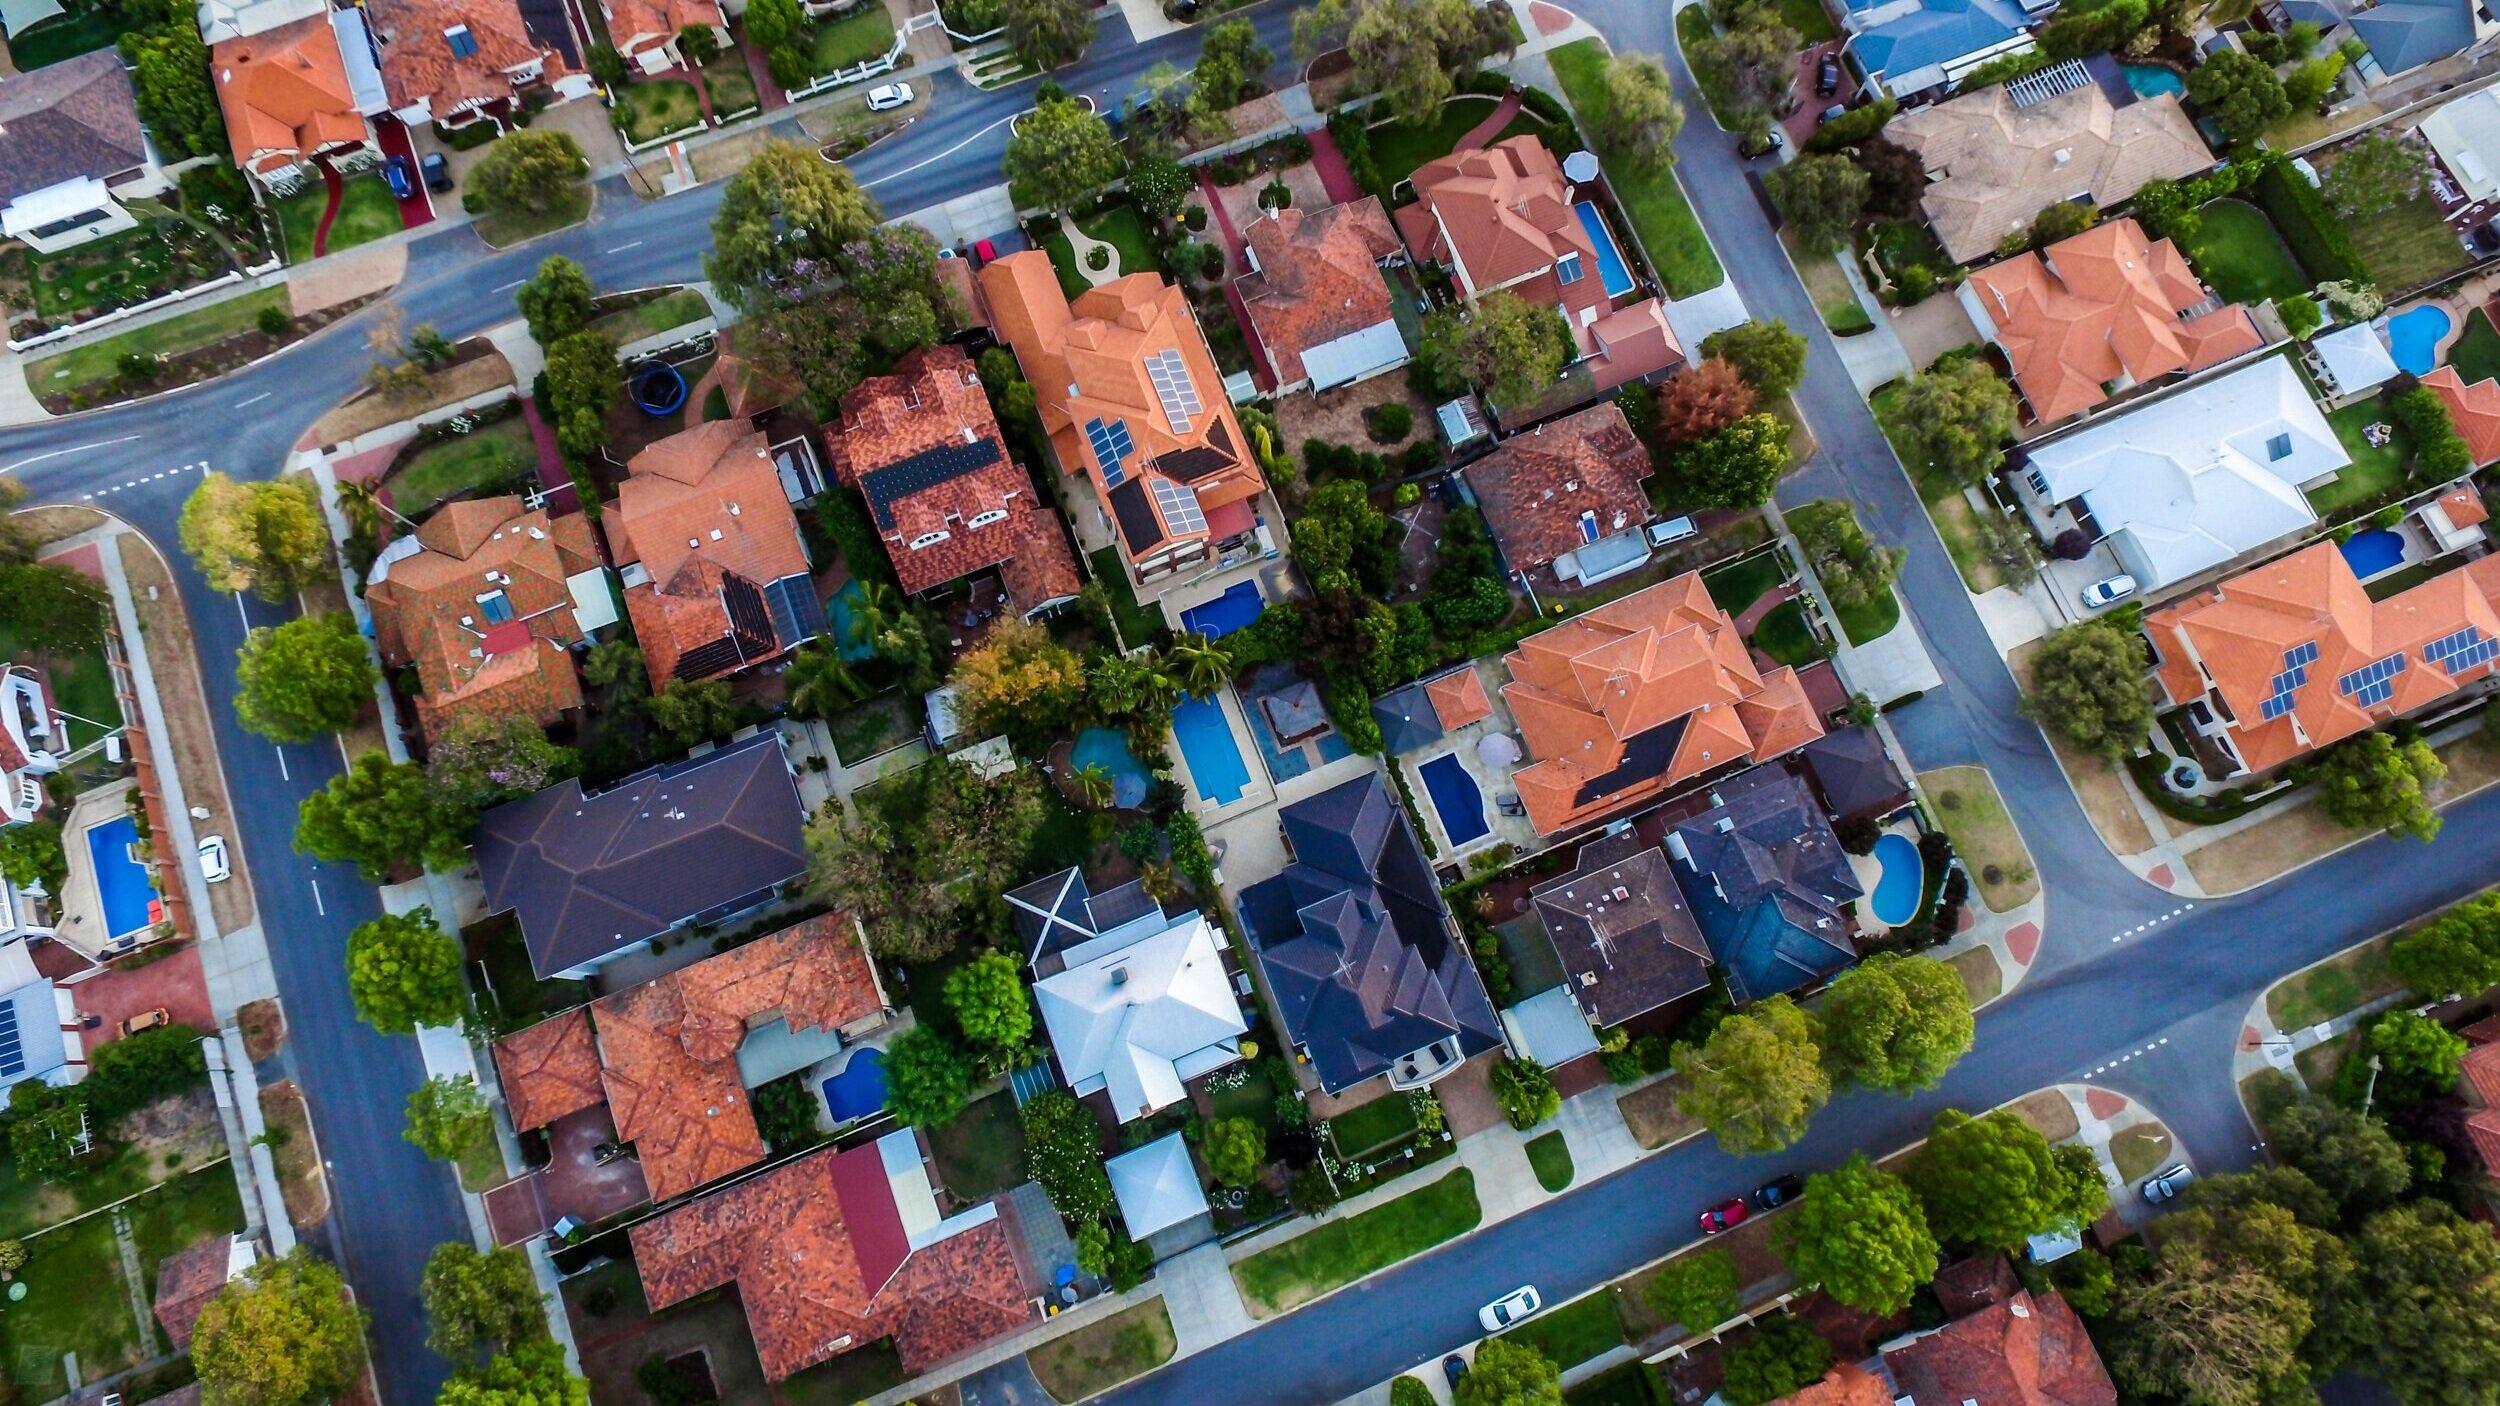 HOUSING 101 - Needs, Development, and Process